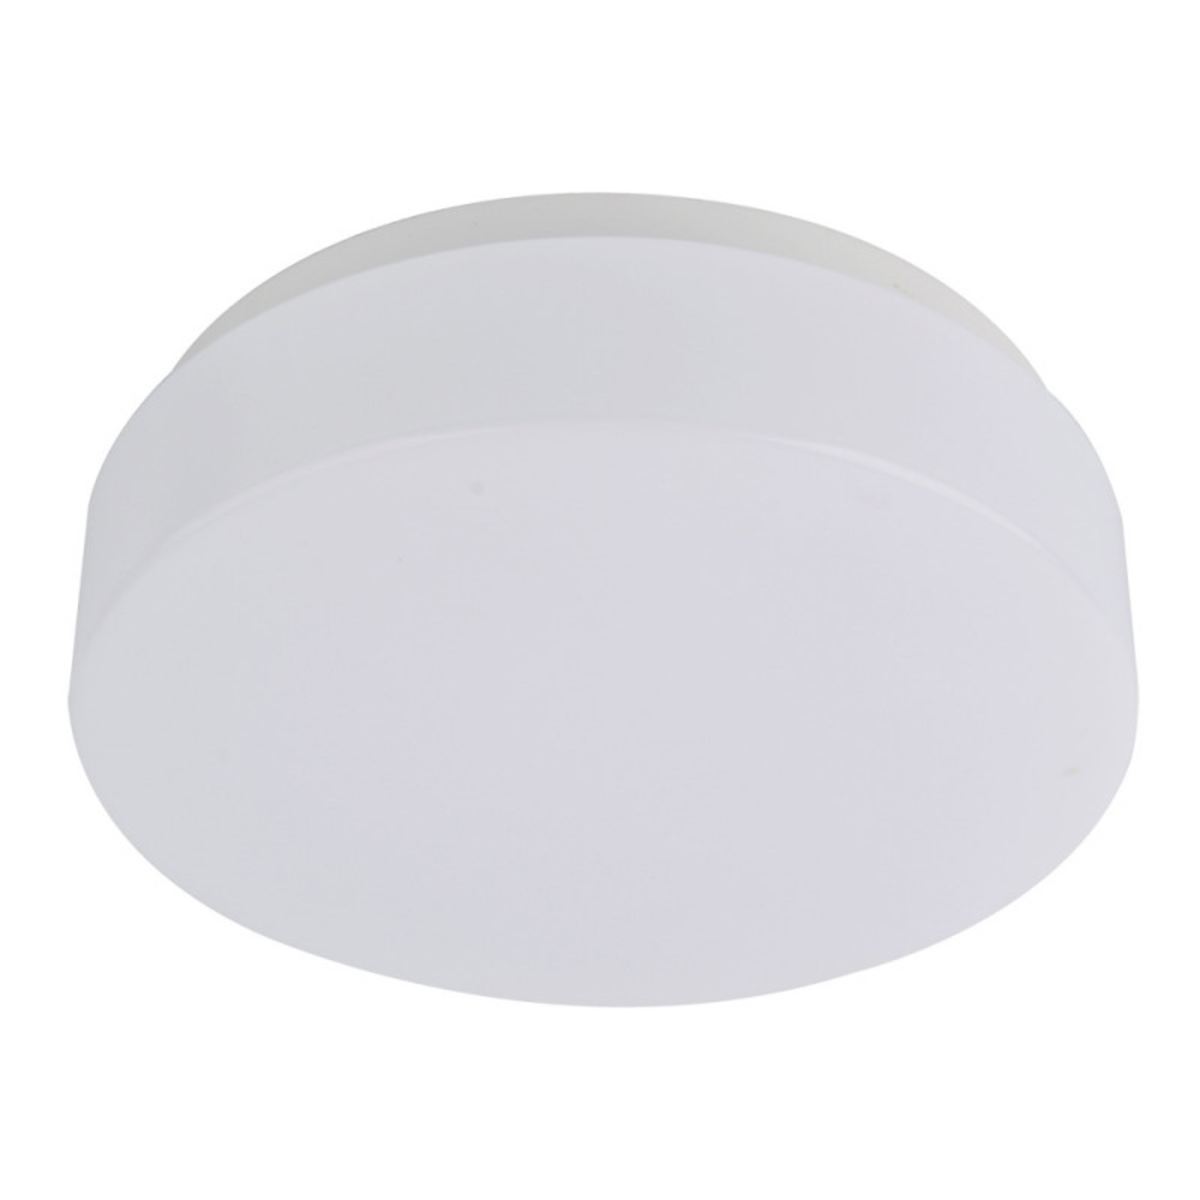 Купить Накладной светильник GAMBA Накладной светильник ARTE Lamp A3106PL-1WH (15789), HomeMe